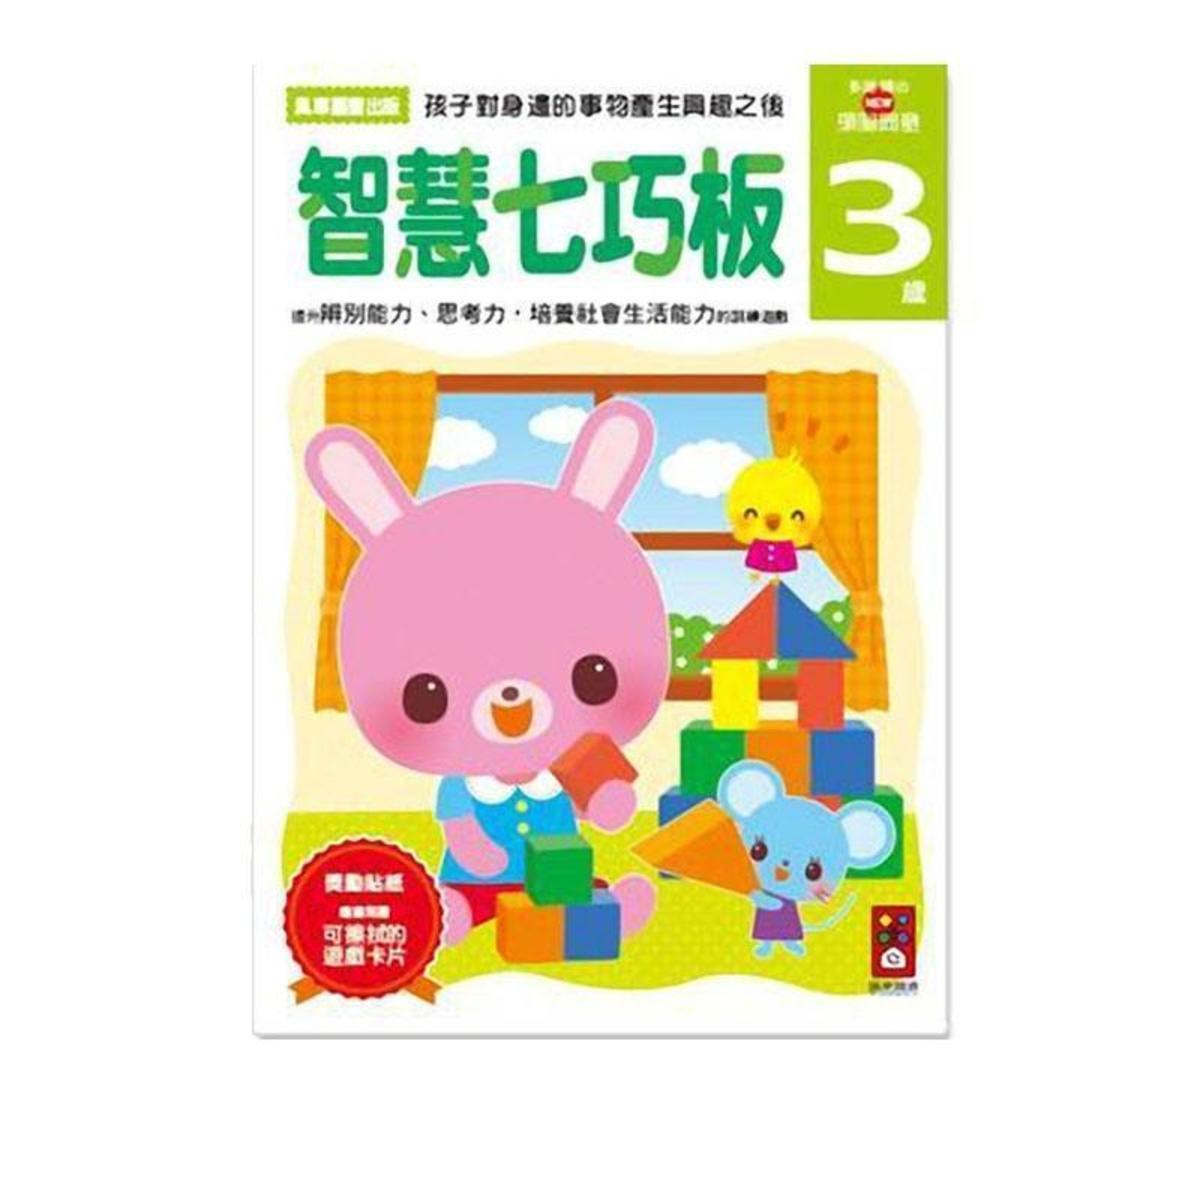 Publishing Smart Jigsaw Puzzle 3 years old - Multi-Huhui's NEW Mind Development Taiwan Import